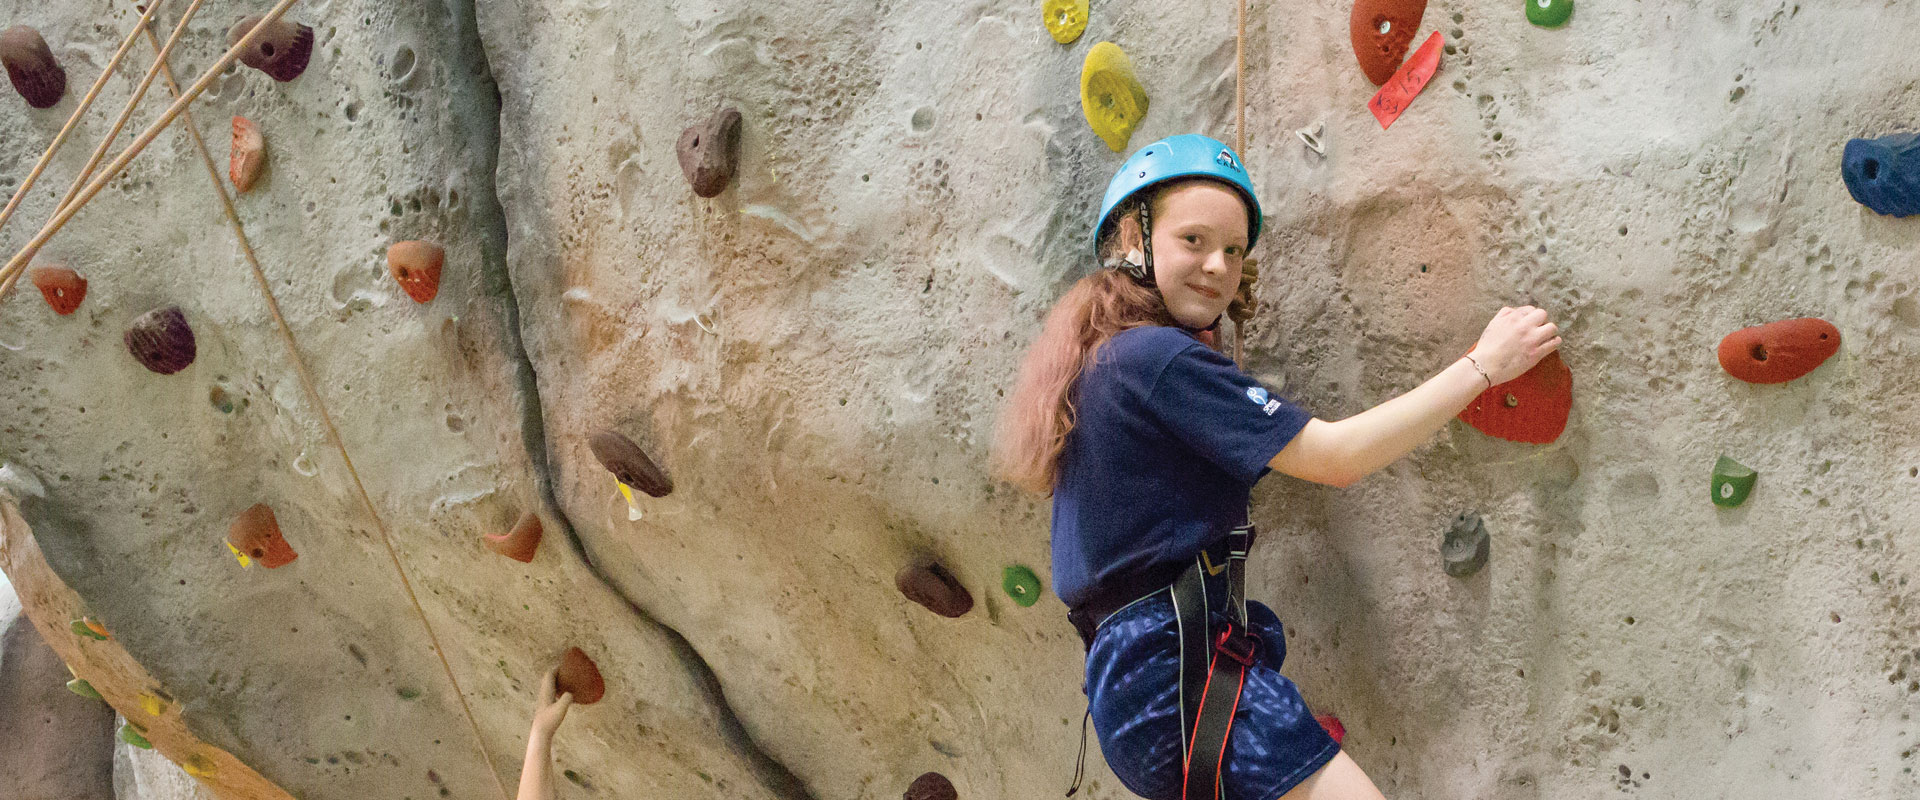 Student climbing wall